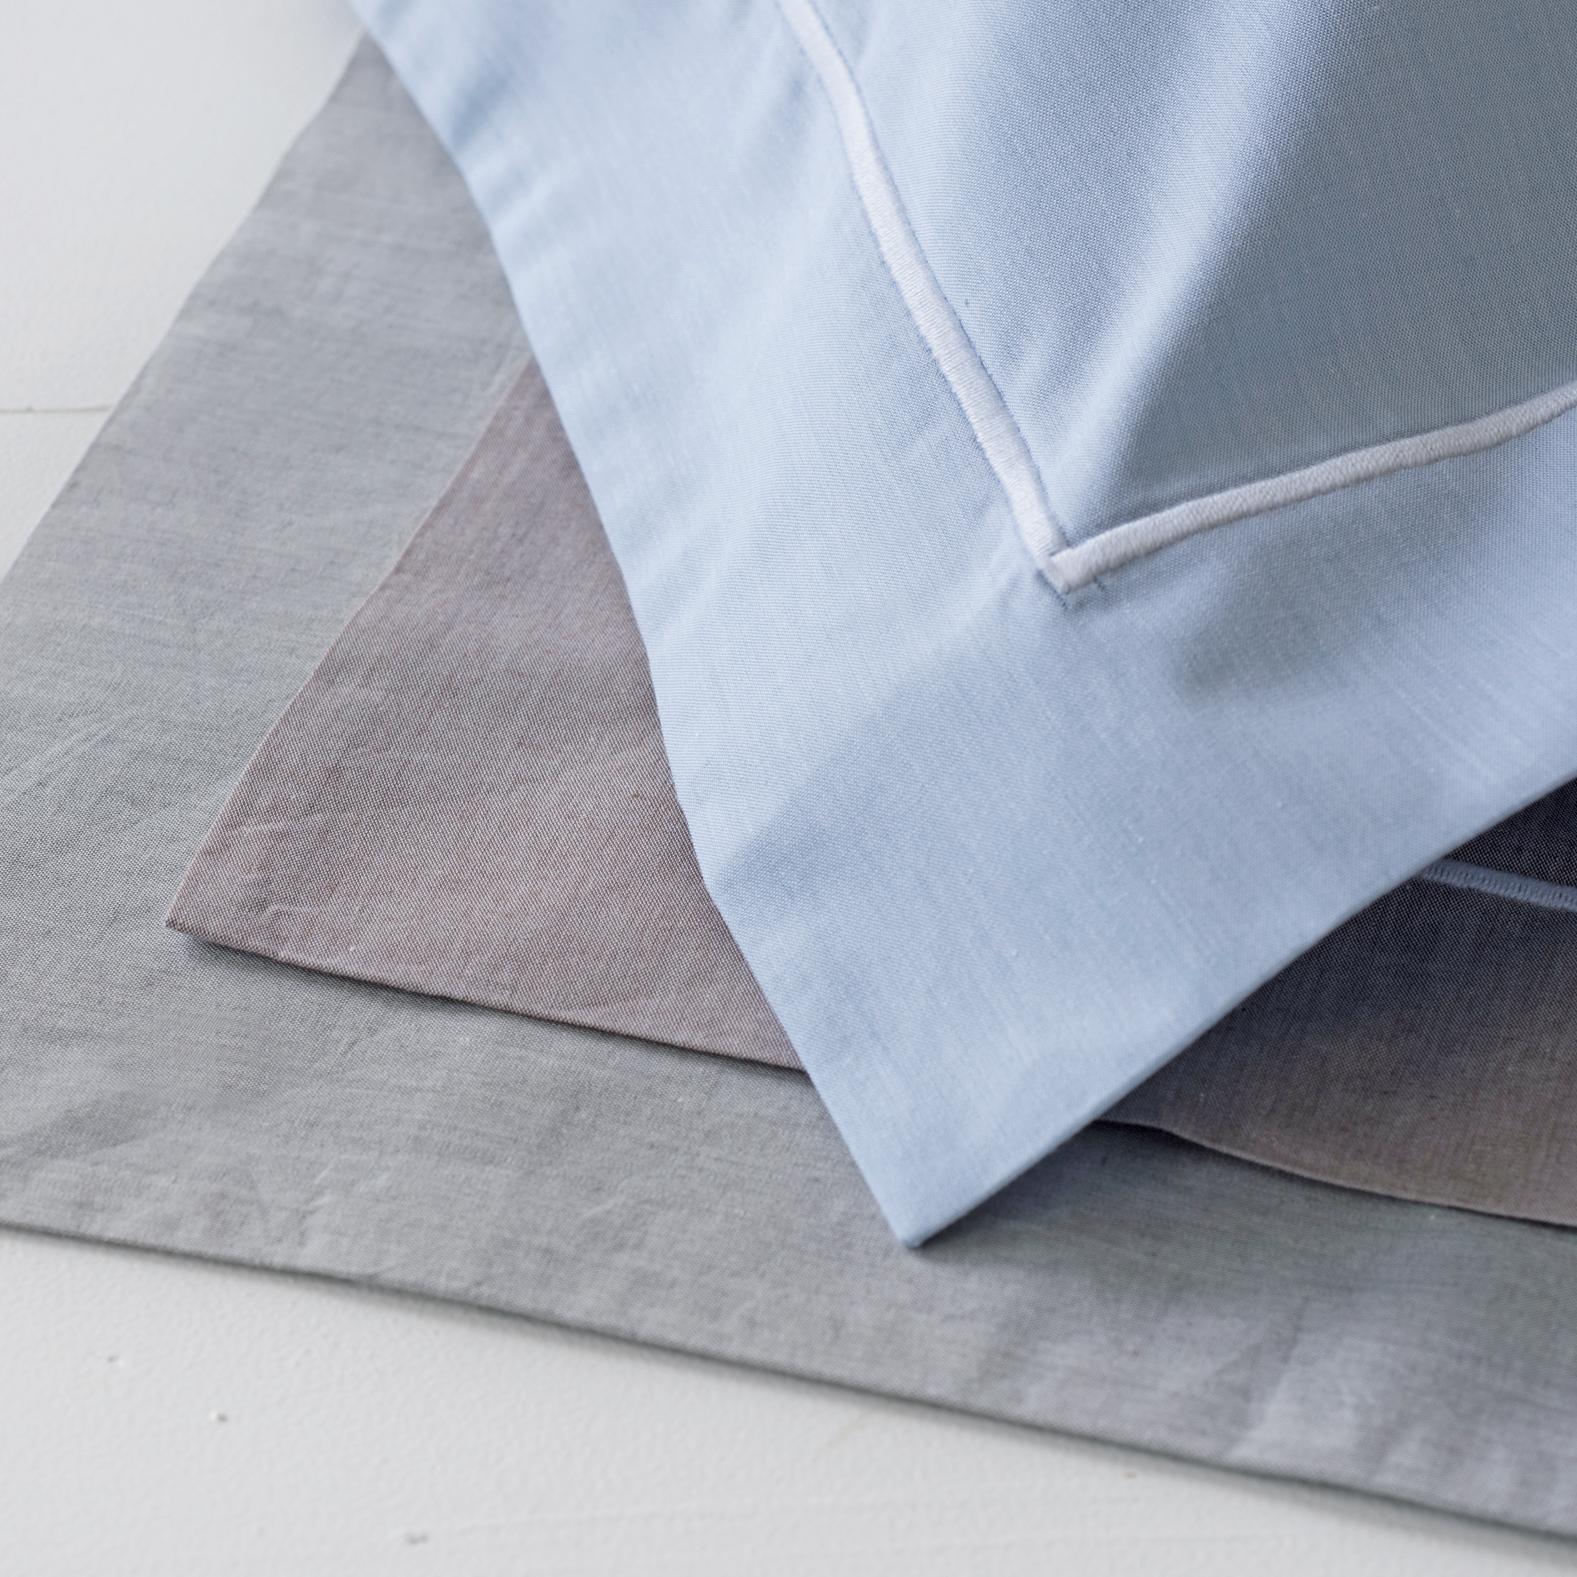 torquato kissenbezug perkal 40 x 80 cm bei. Black Bedroom Furniture Sets. Home Design Ideas